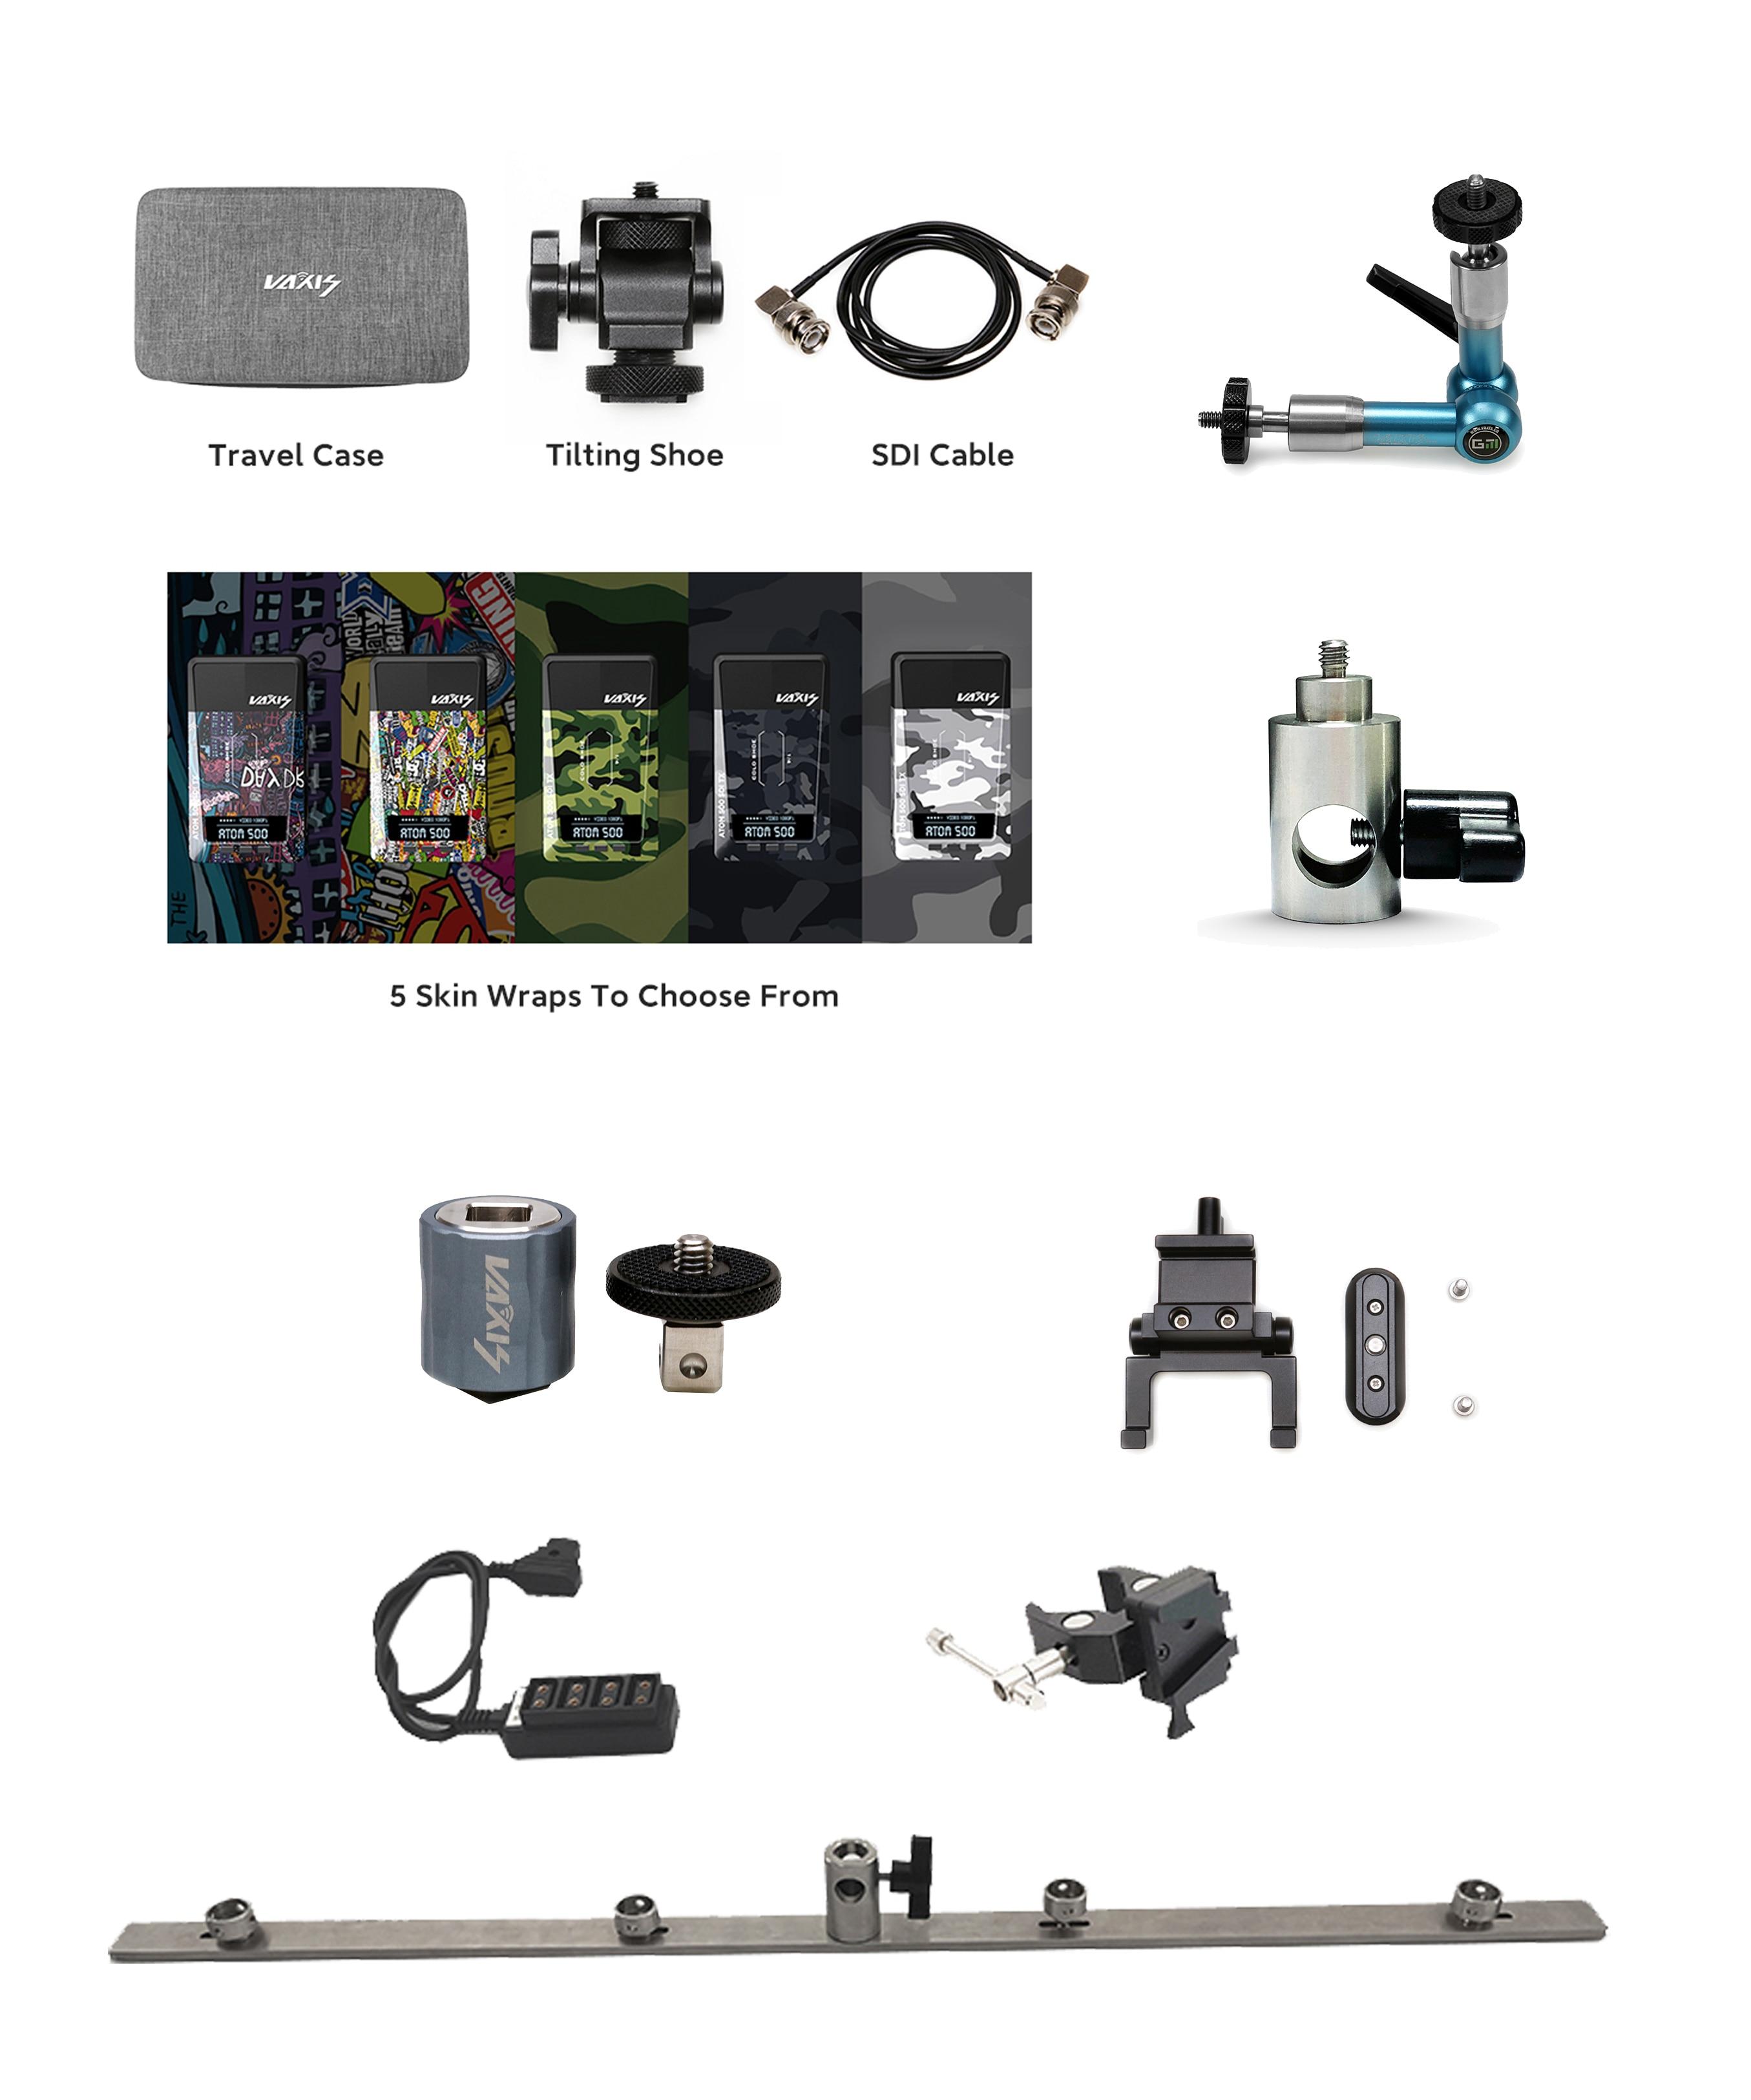 VAXIS ملحقات الفيديو اللاسلكية متعددة الوظائف مواصفات مختلفة حامل ماجيك الذراع كابل حقيبة حماية الجلد الخ